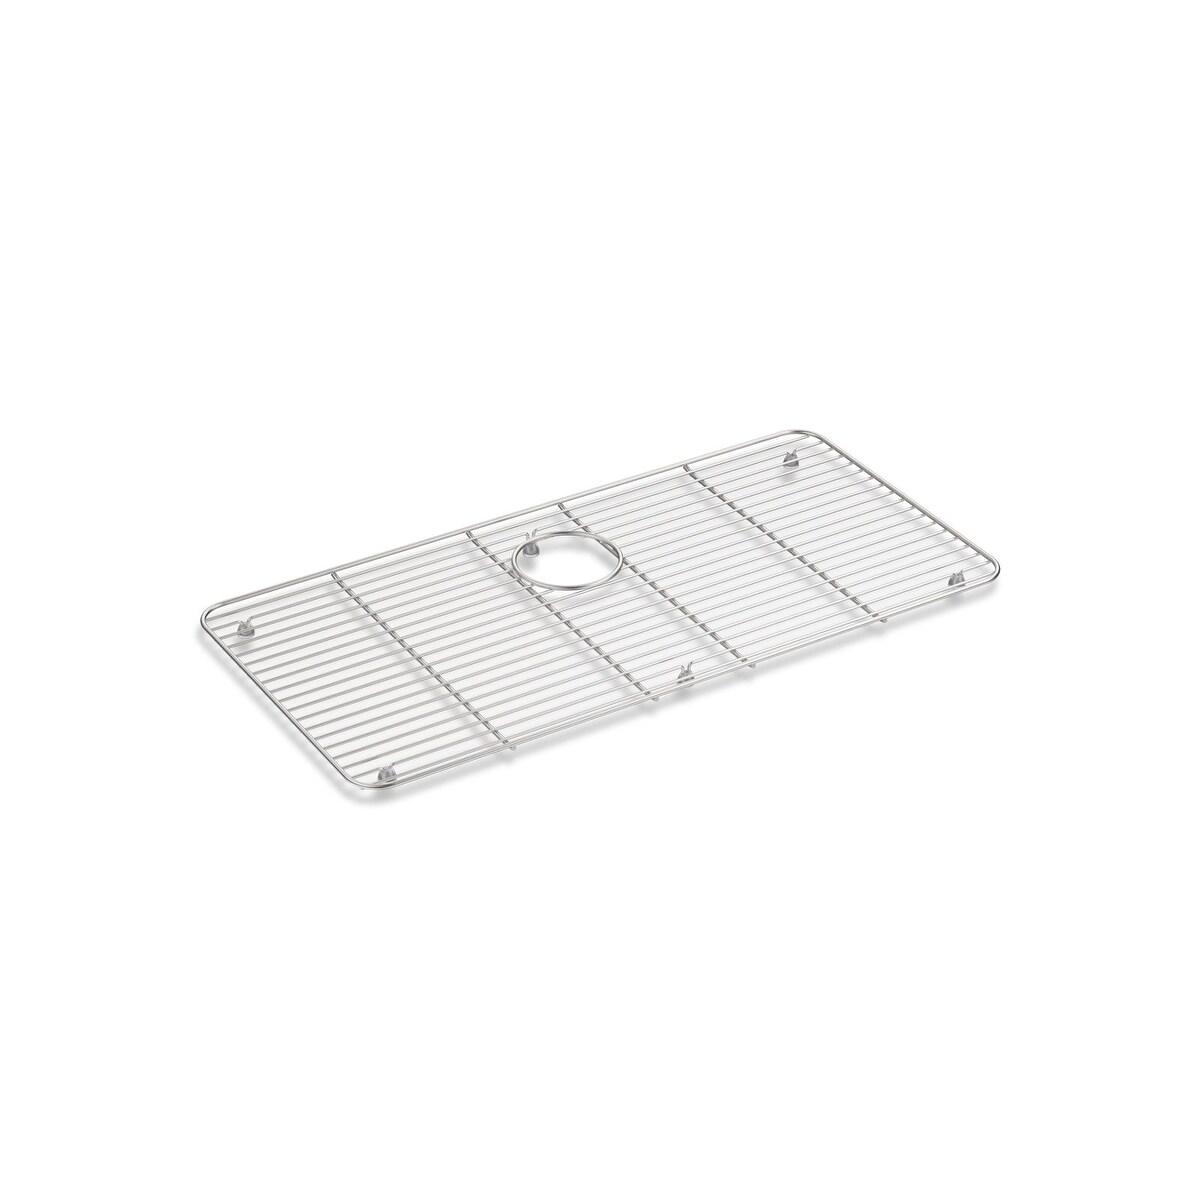 kohler bakersfield stainless steel sink rack 25 x 12 3 4 stainless steel k 6517 st